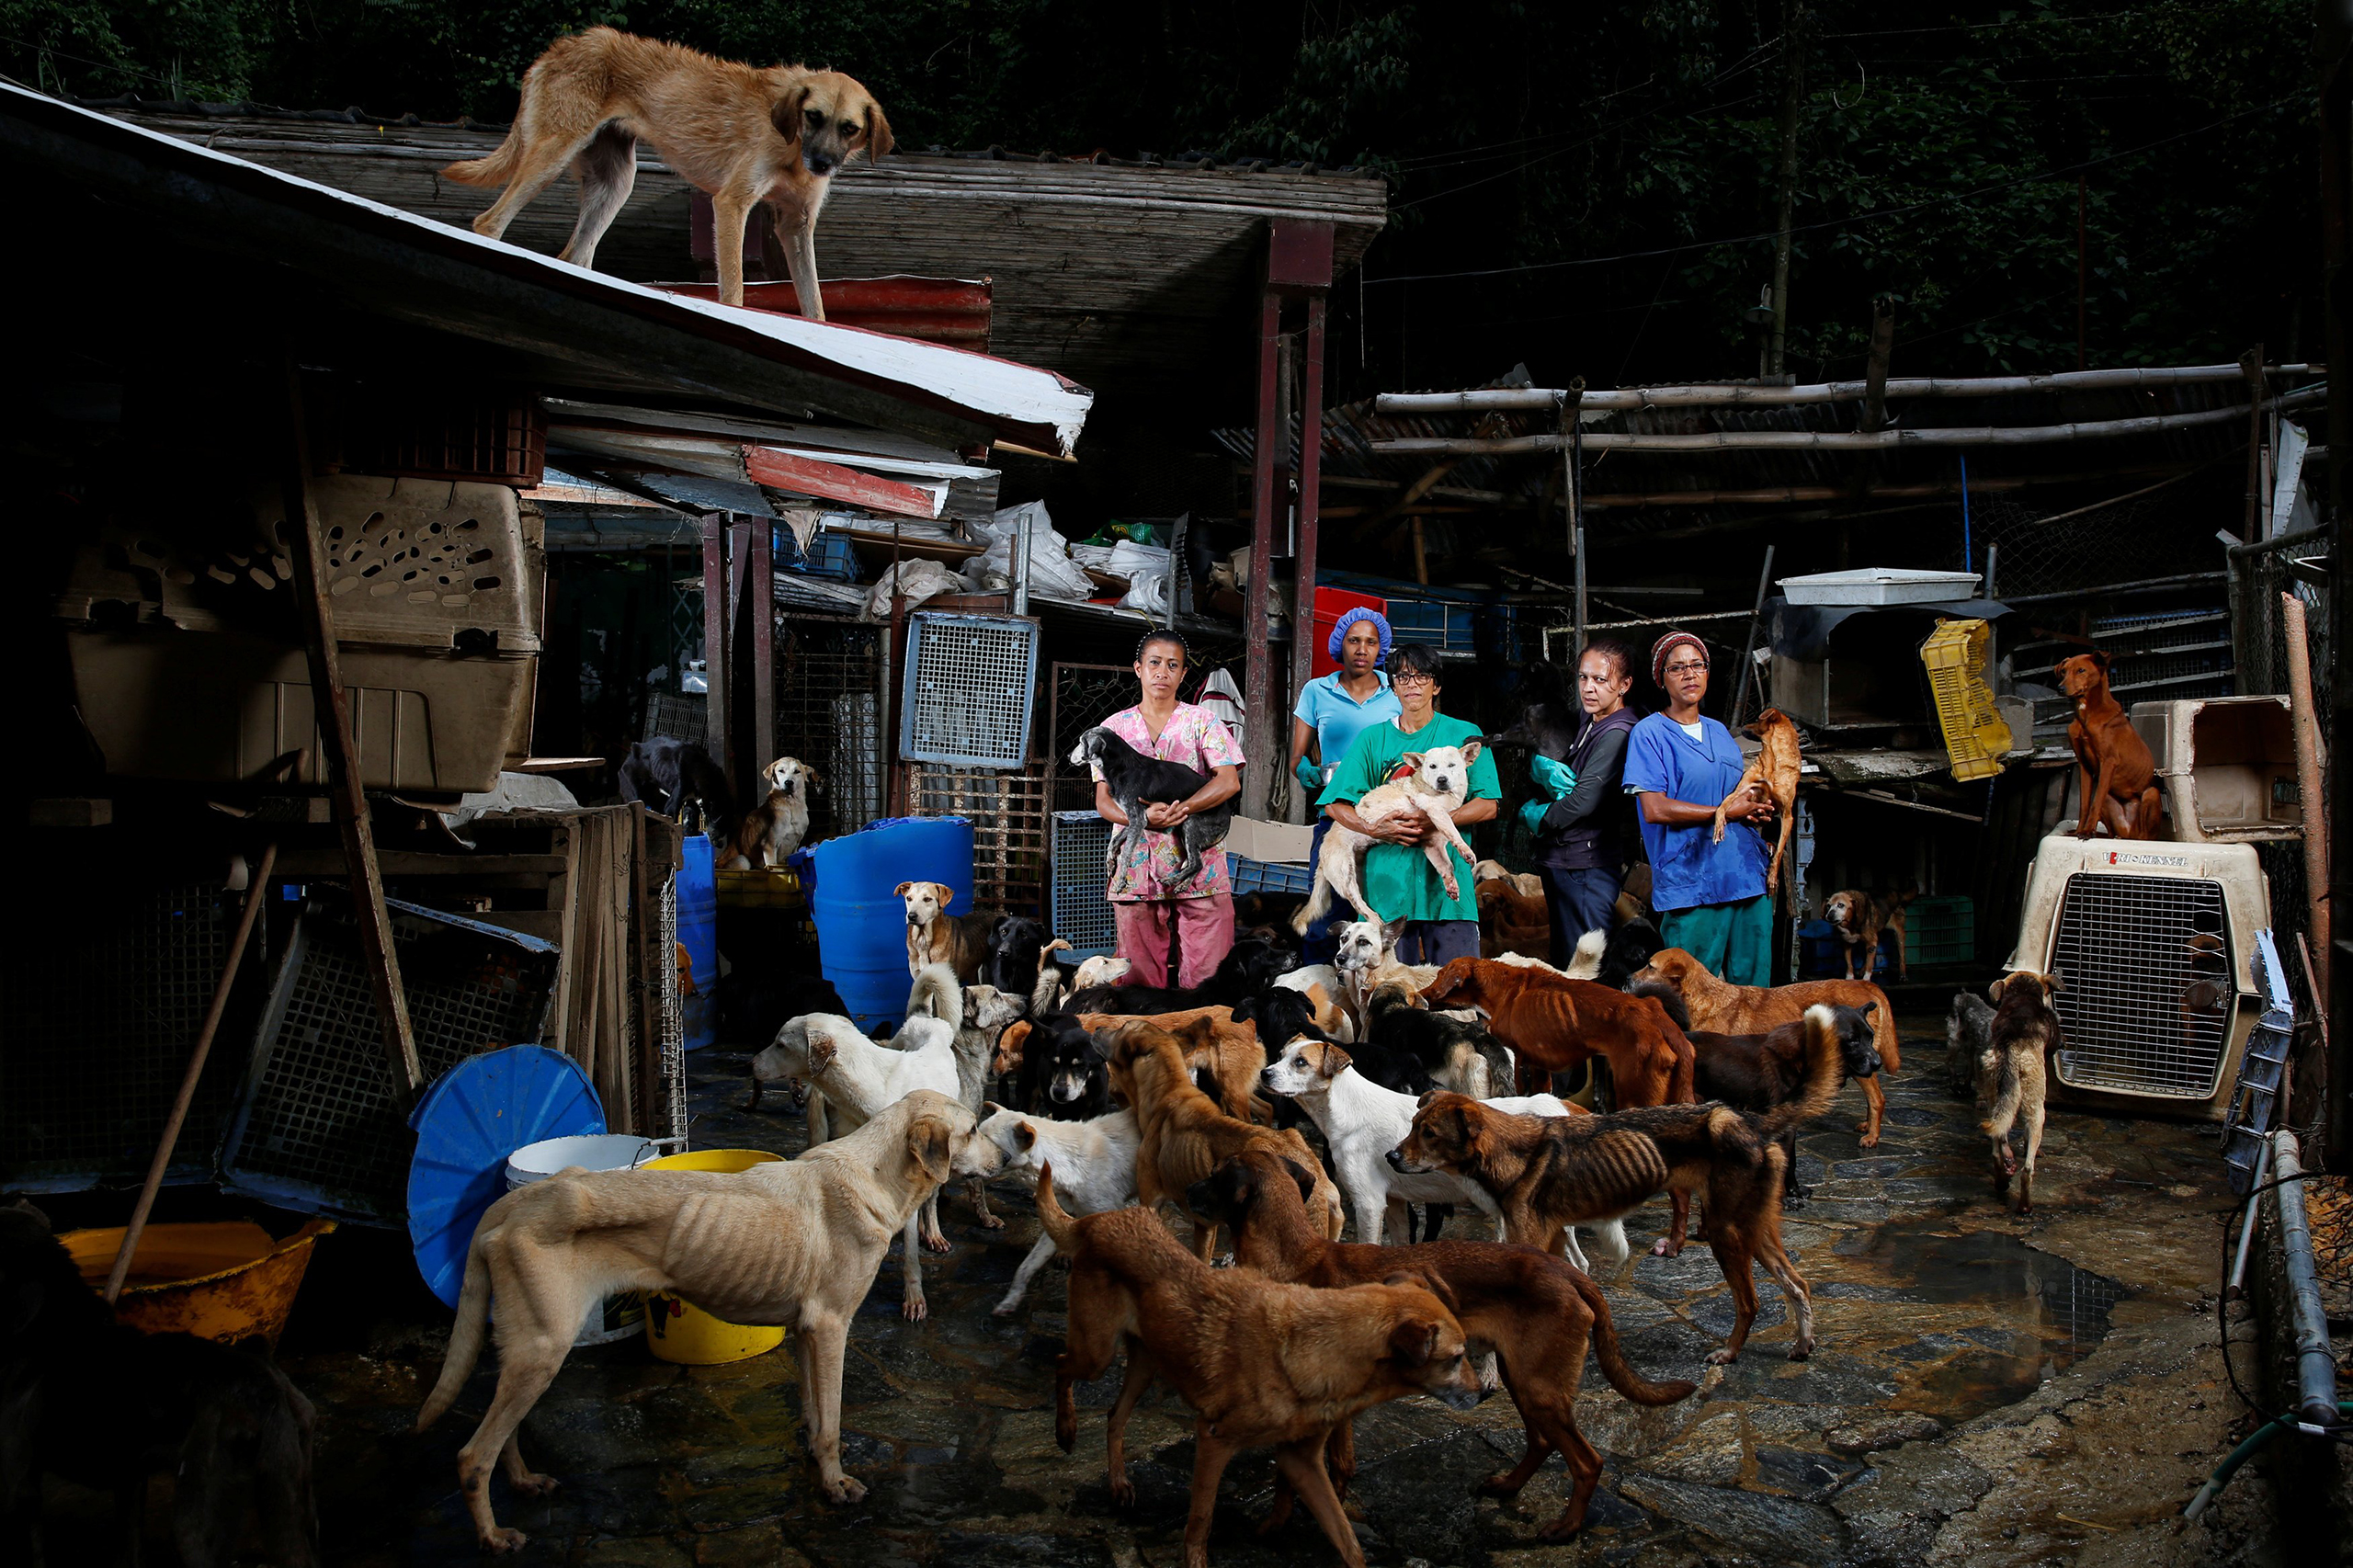 Maria Silva, Milena Cortes, Maria Arteaga, Jackeline Bastidas and Gissy Abello pose for a picture at the Famproa dogs shelter where they work, in Los Teques, Venezuela, Aug. 25, 2016.